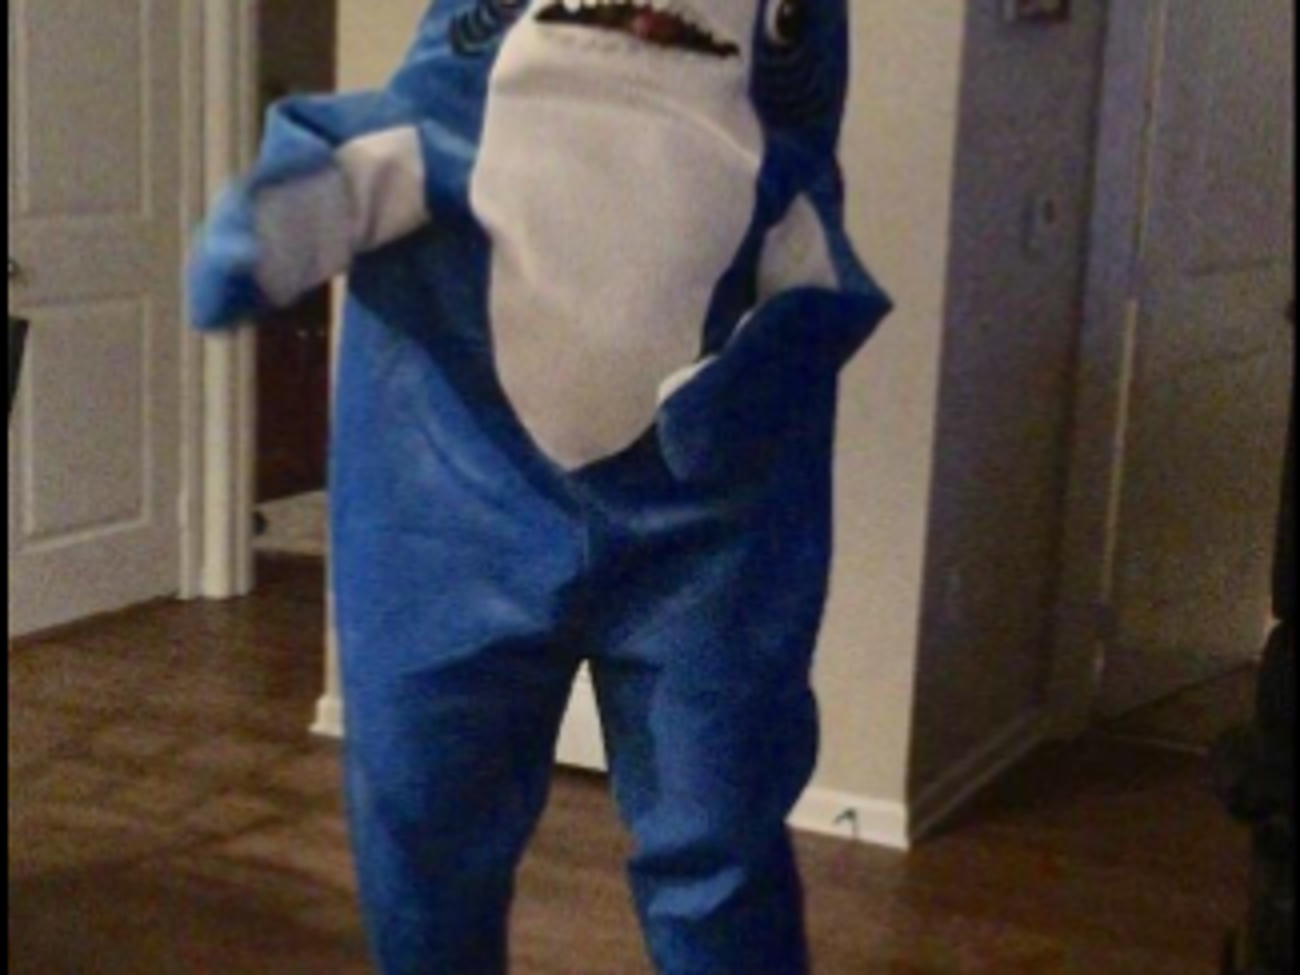 Katy Perry Left Shark Funny Cosplay Mascot Costume